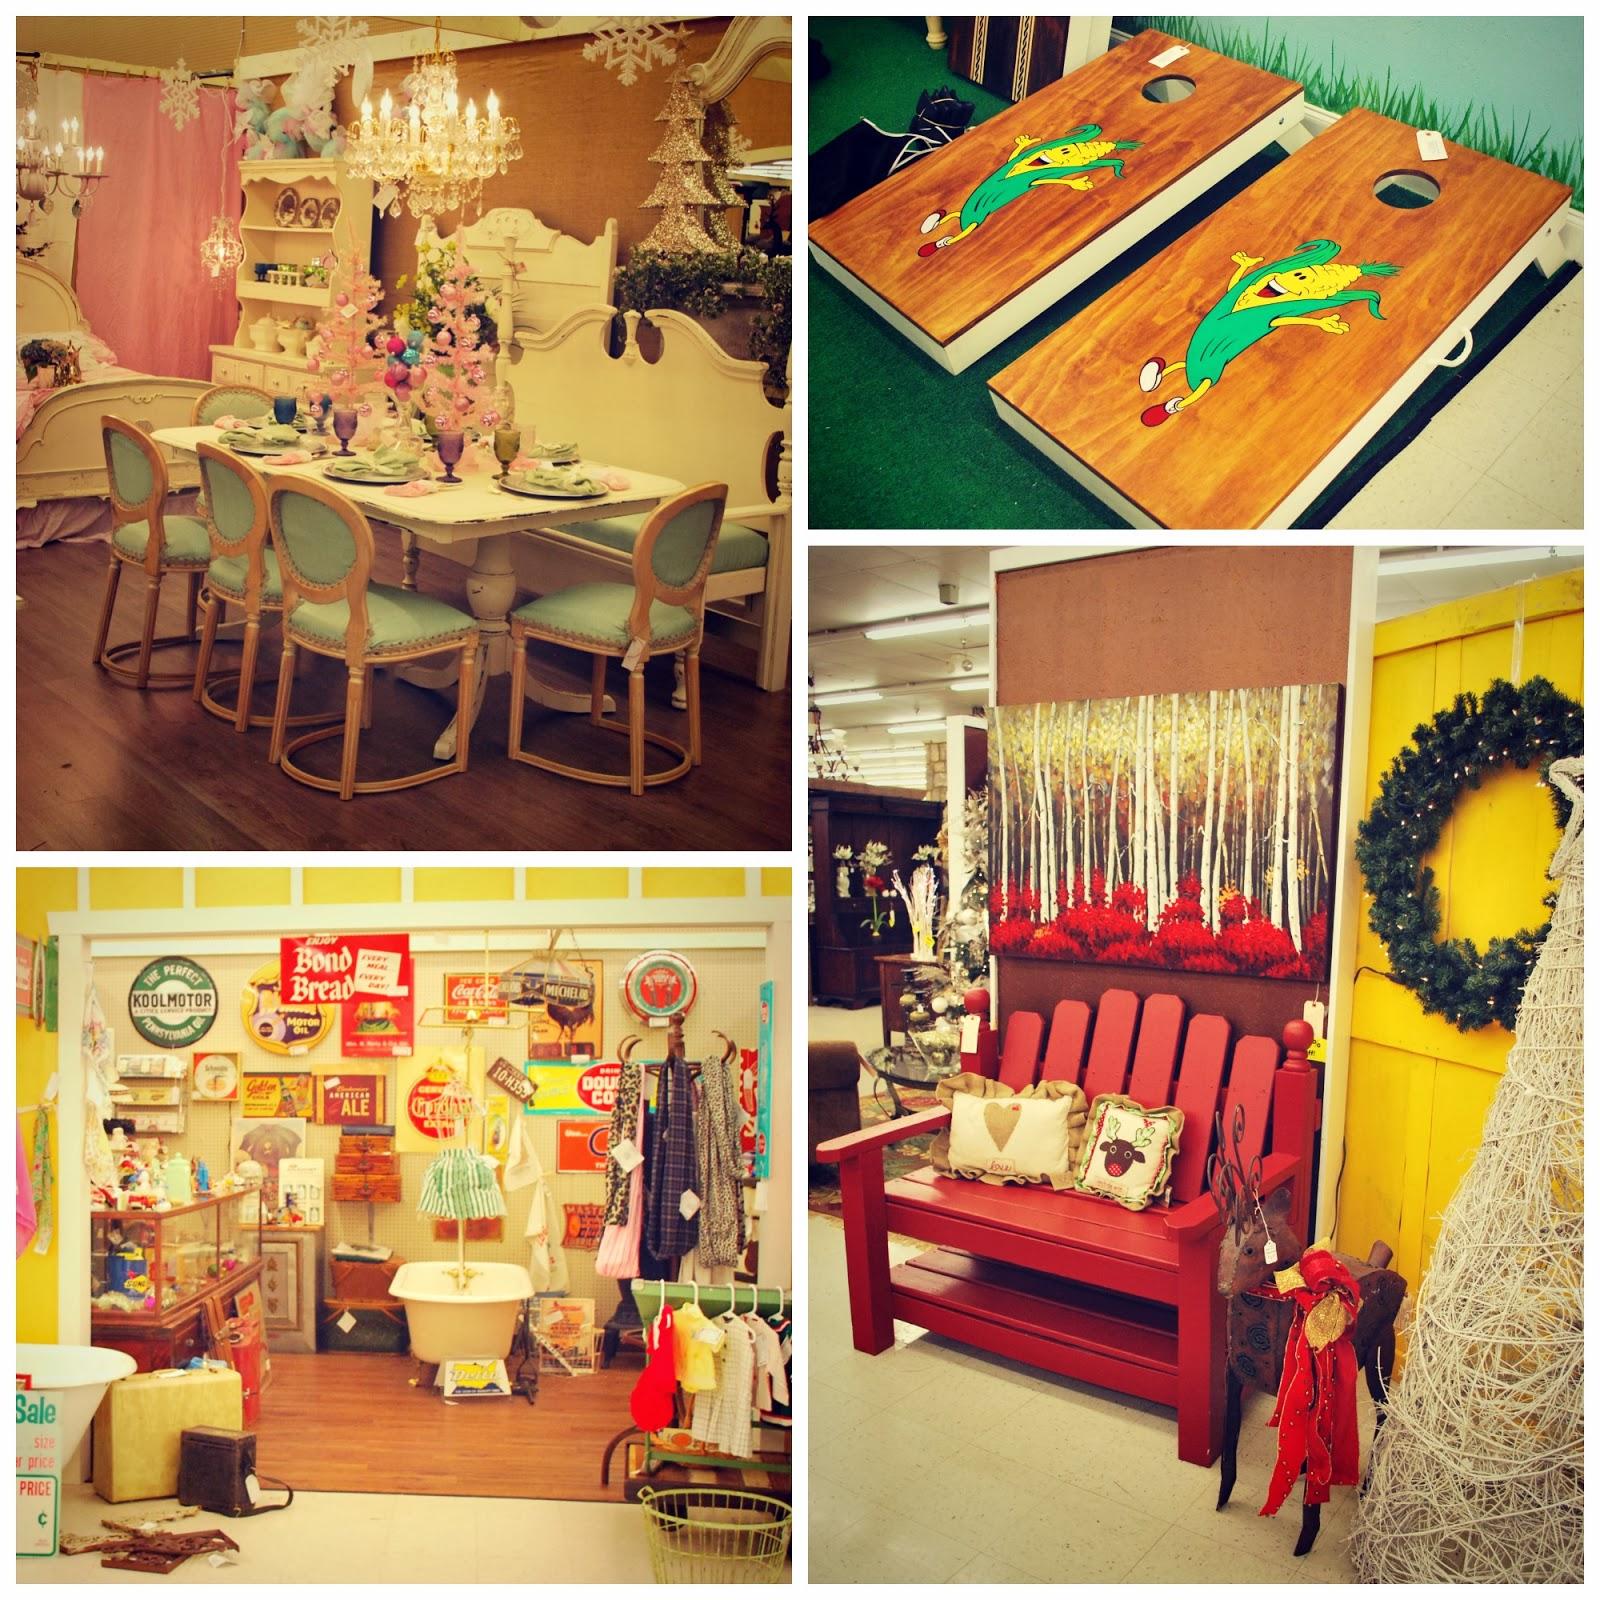 Woodstock Market Consignment, Atlanta Consignment Stores